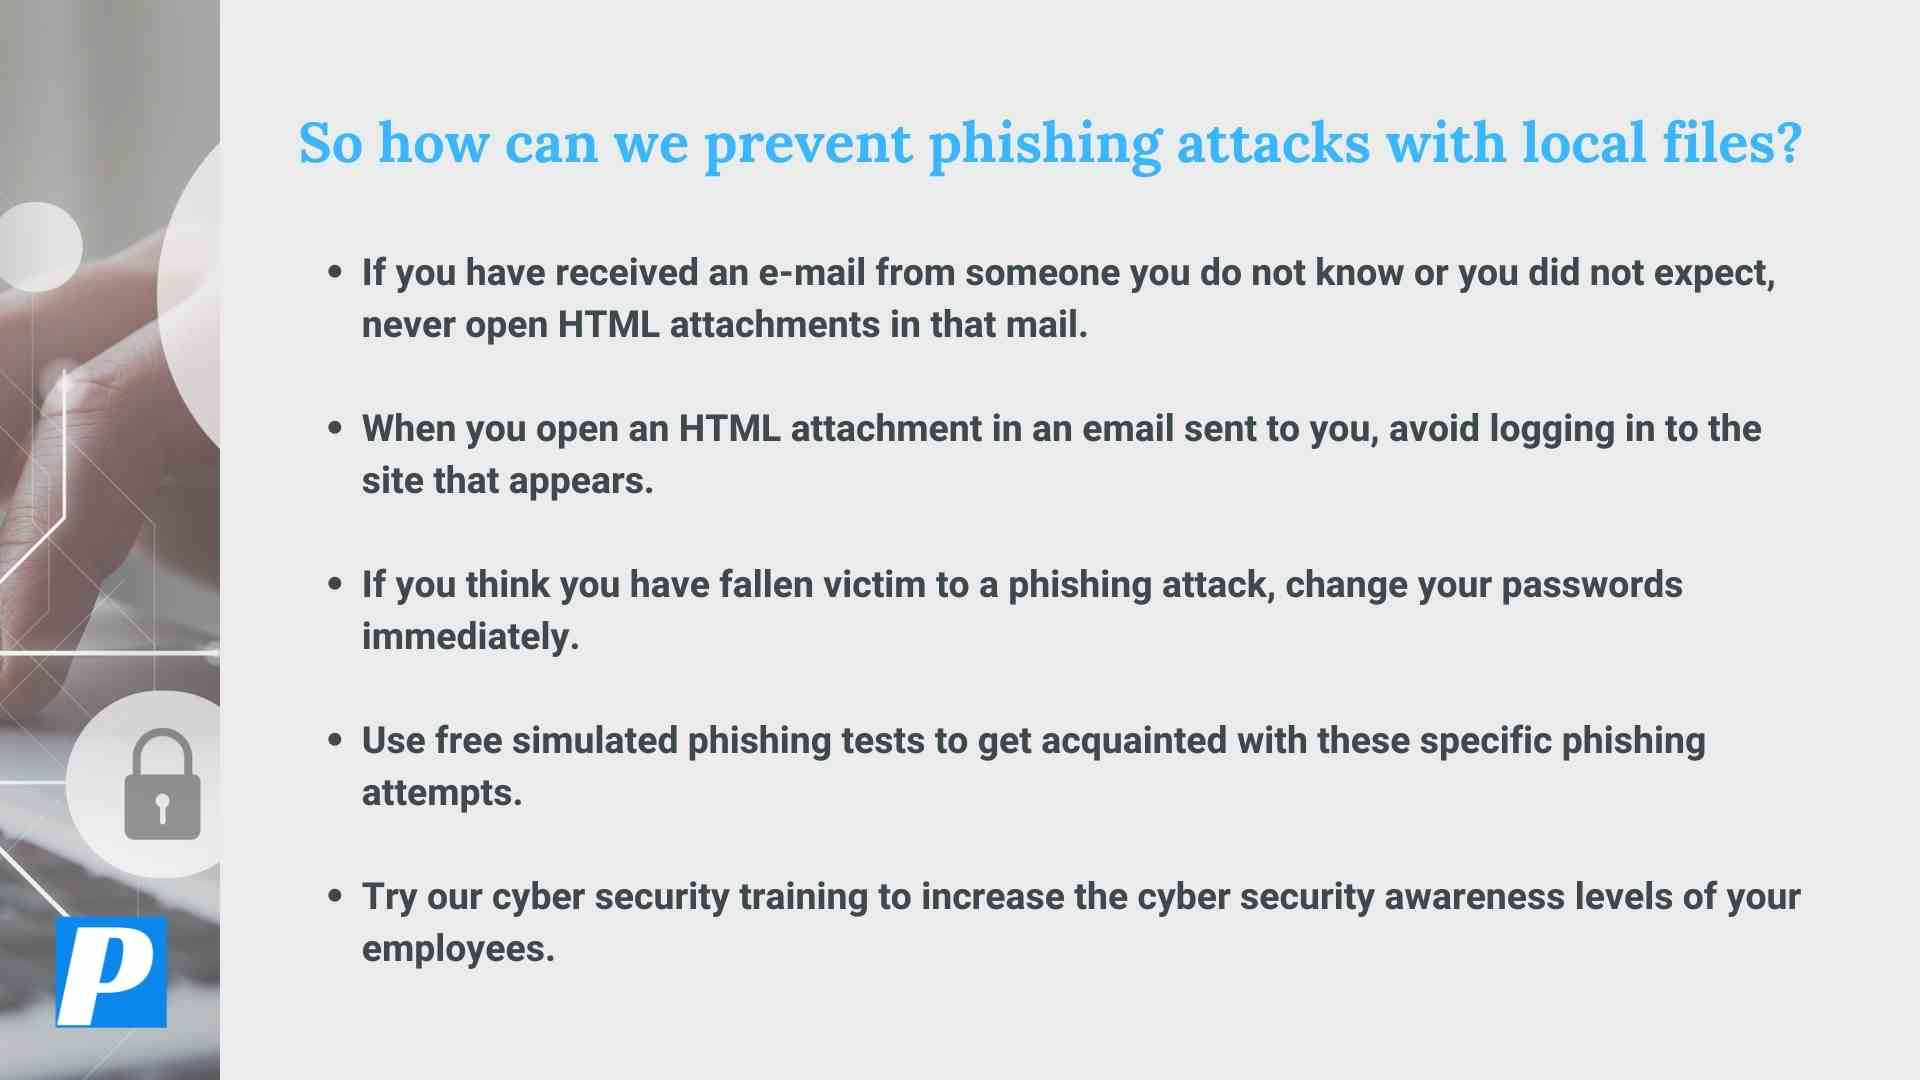 Phishing Attacks Using Local Files